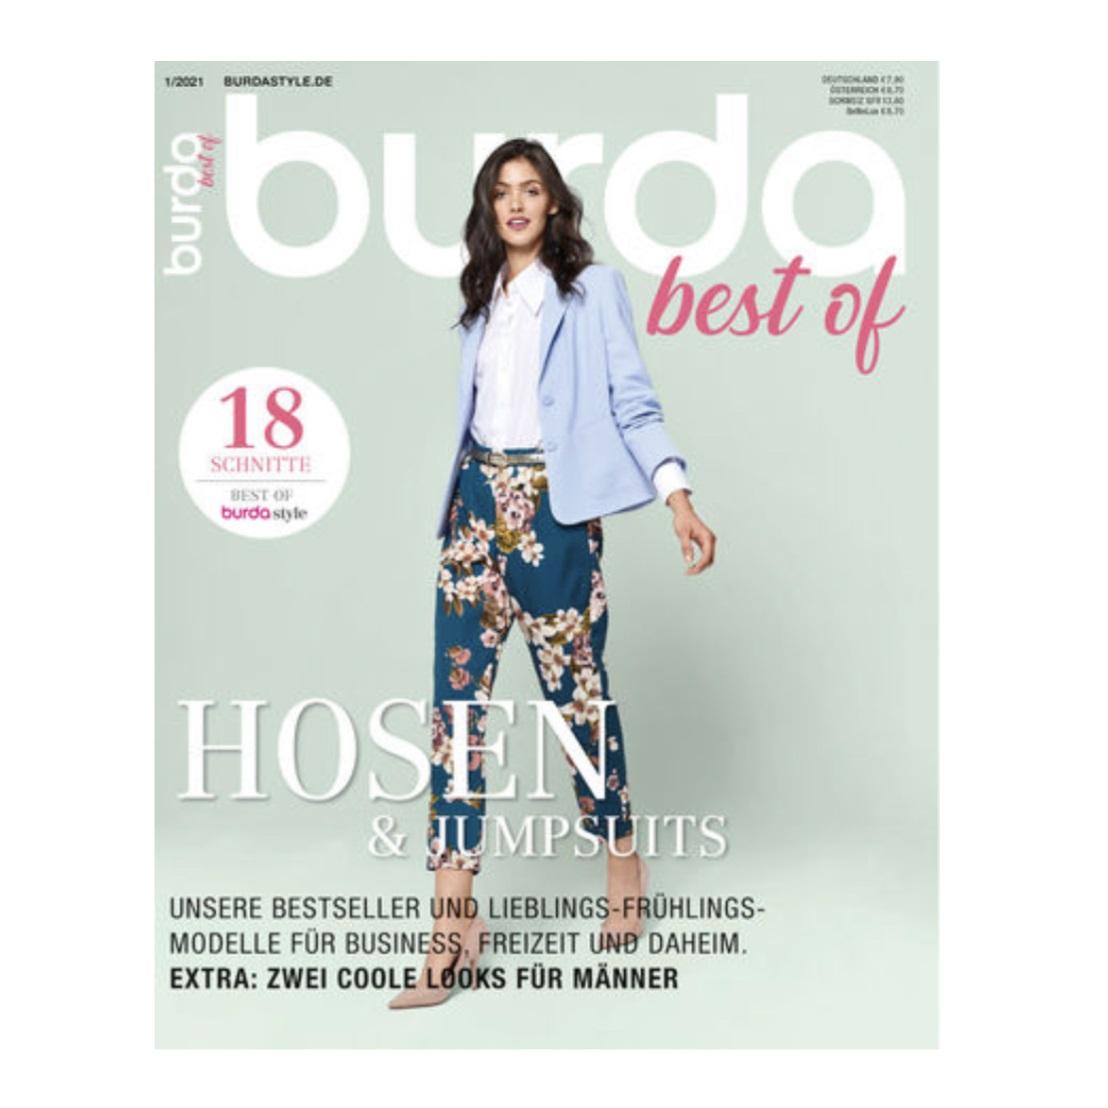 Burda special best of Hosen & Jumpsuits 01/21